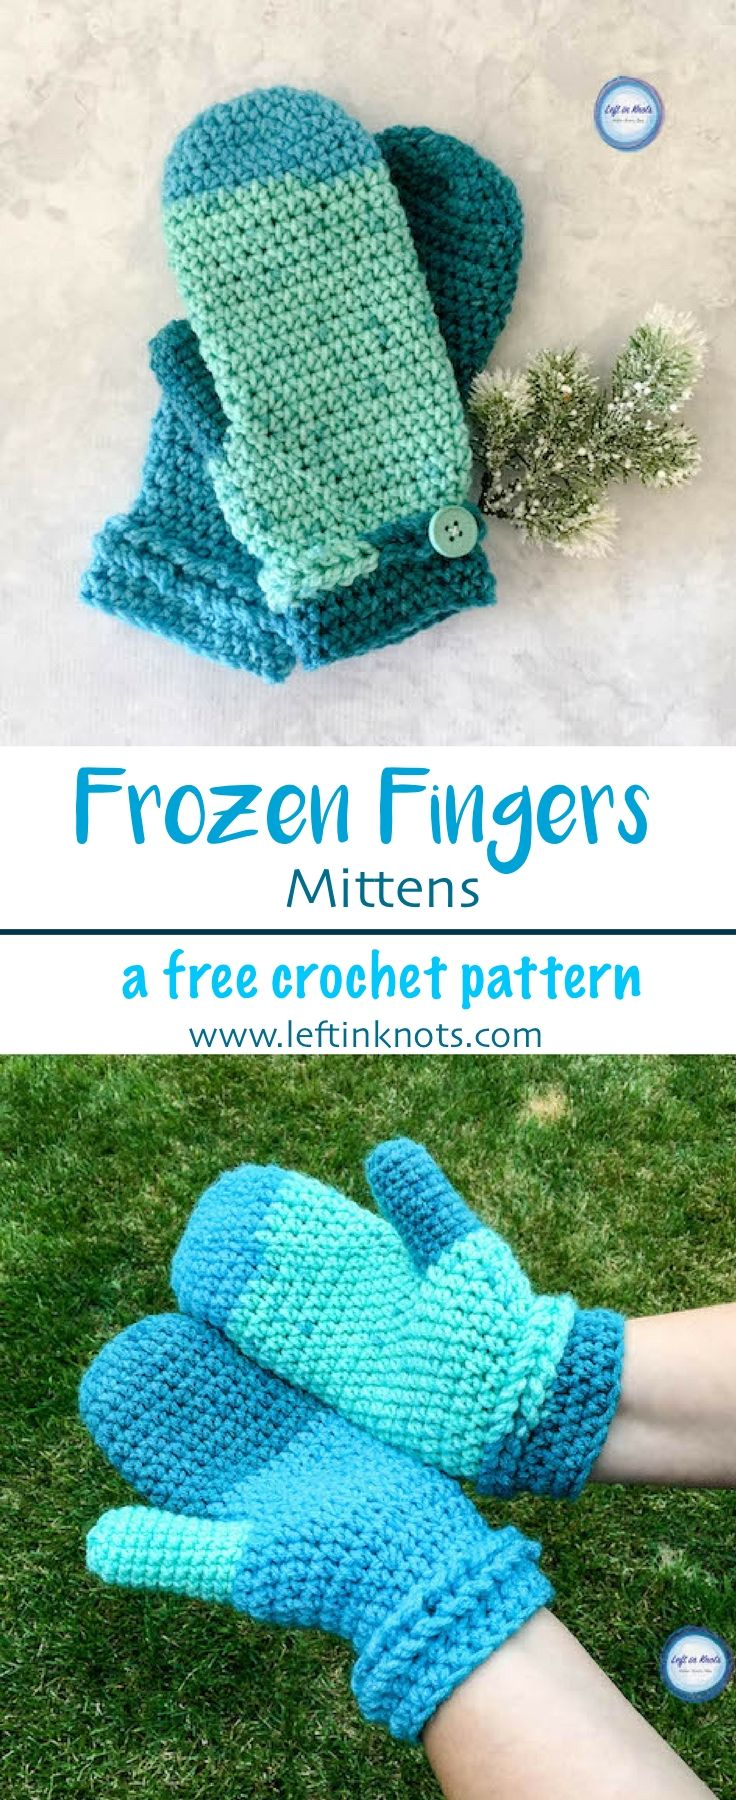 Frozen Fingers Crochet Mittens   Free crochet, Mittens and Finger